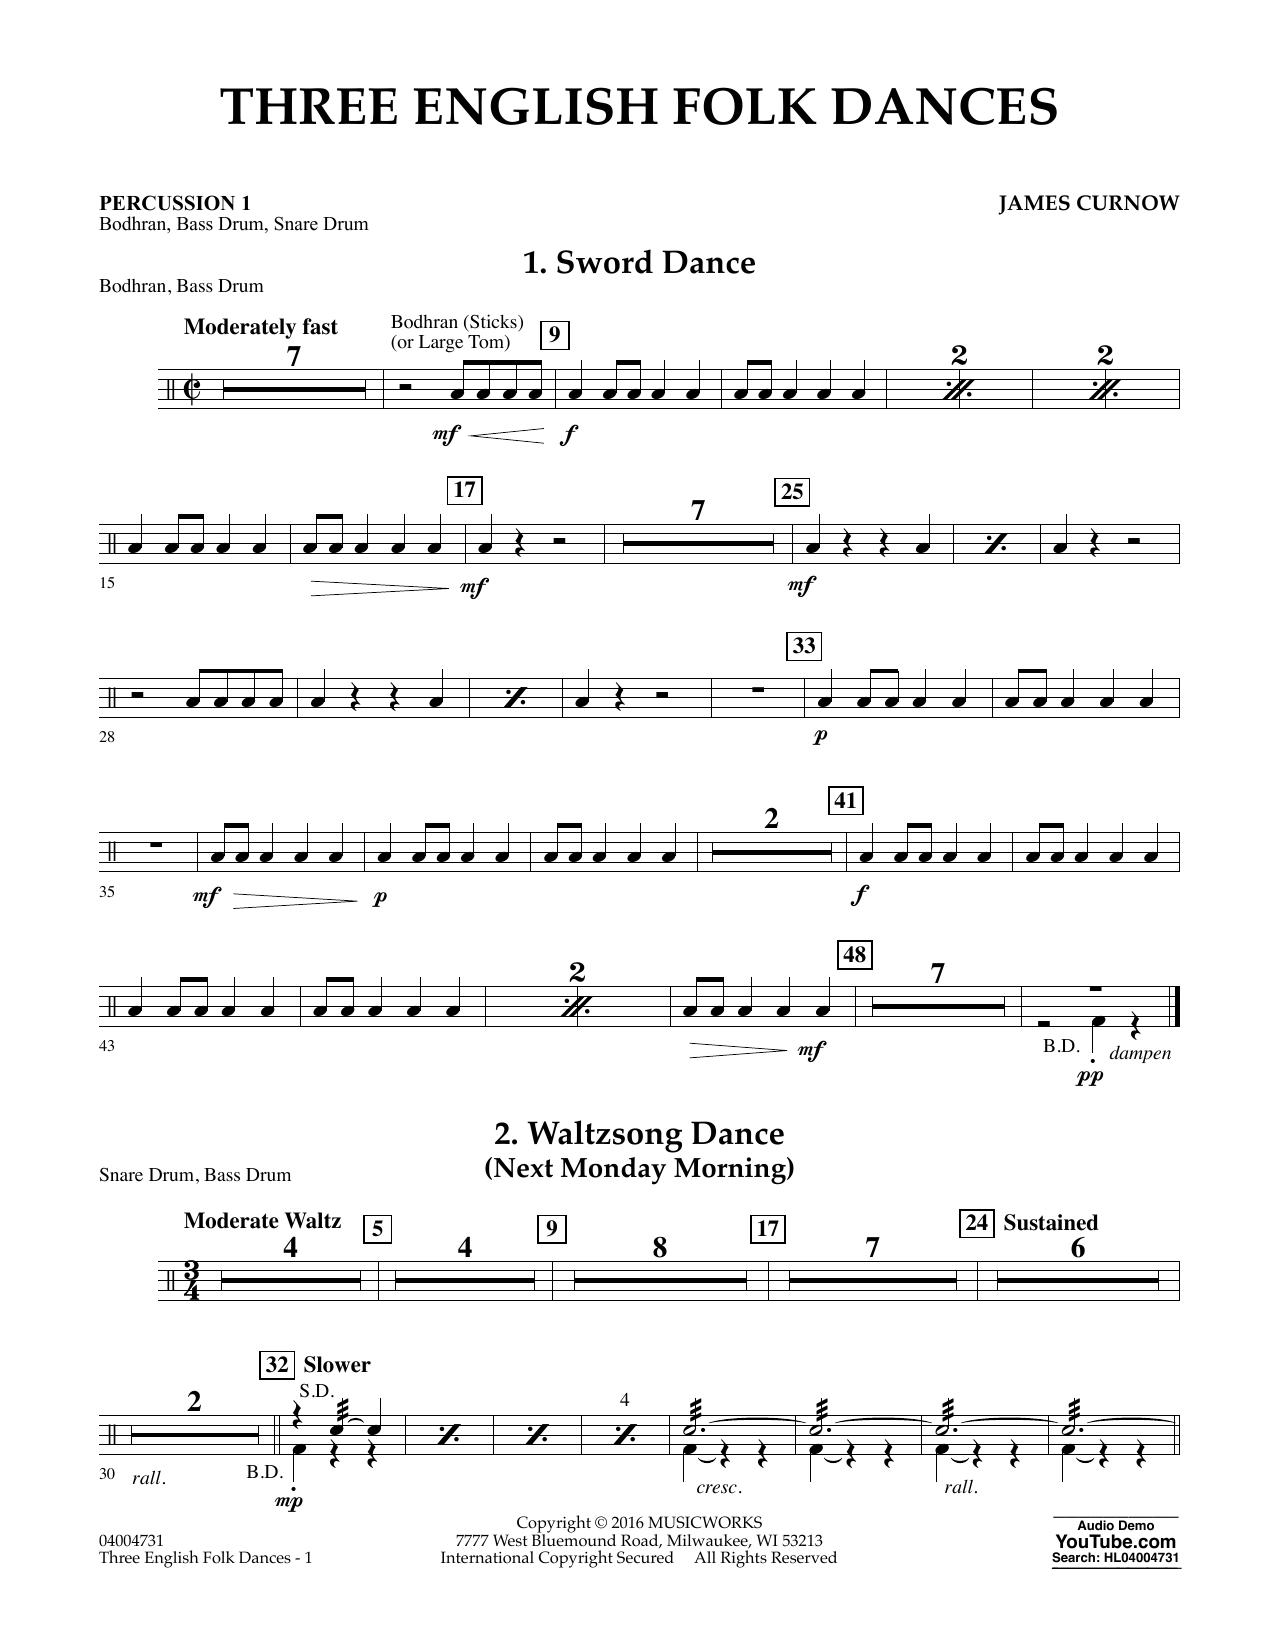 Three English Folk Dances - Percussion 1